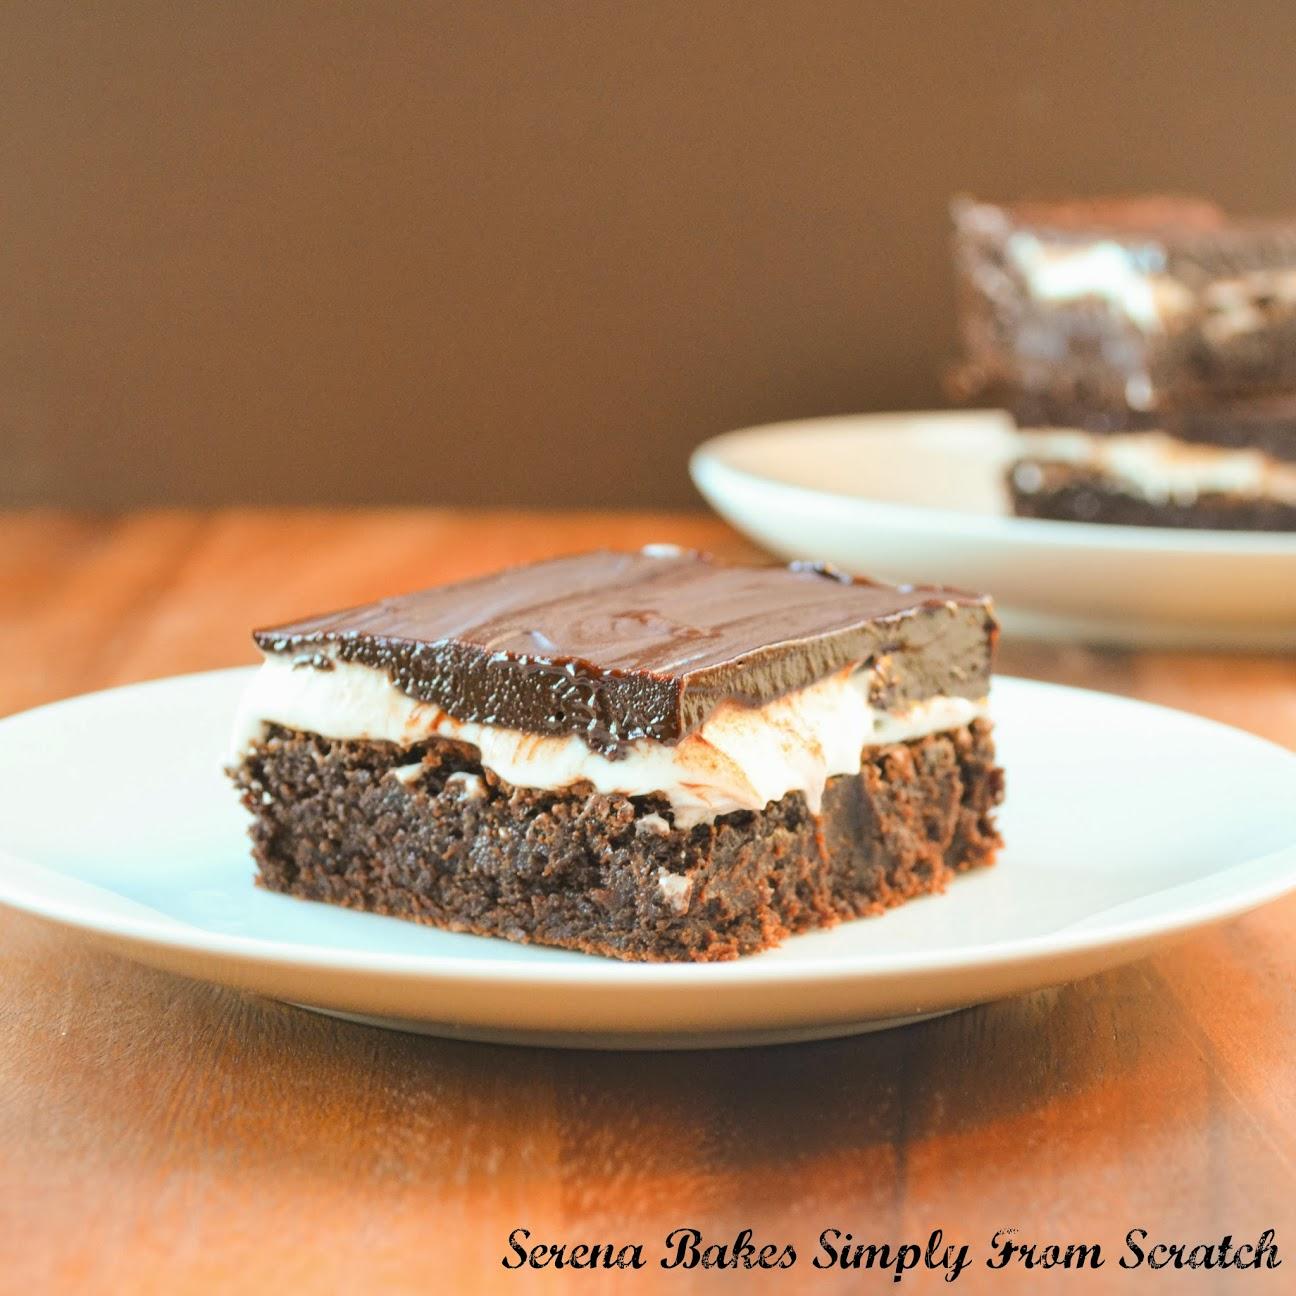 Creme-De-Menthe-Fudge-Brownies-Serve.jpg